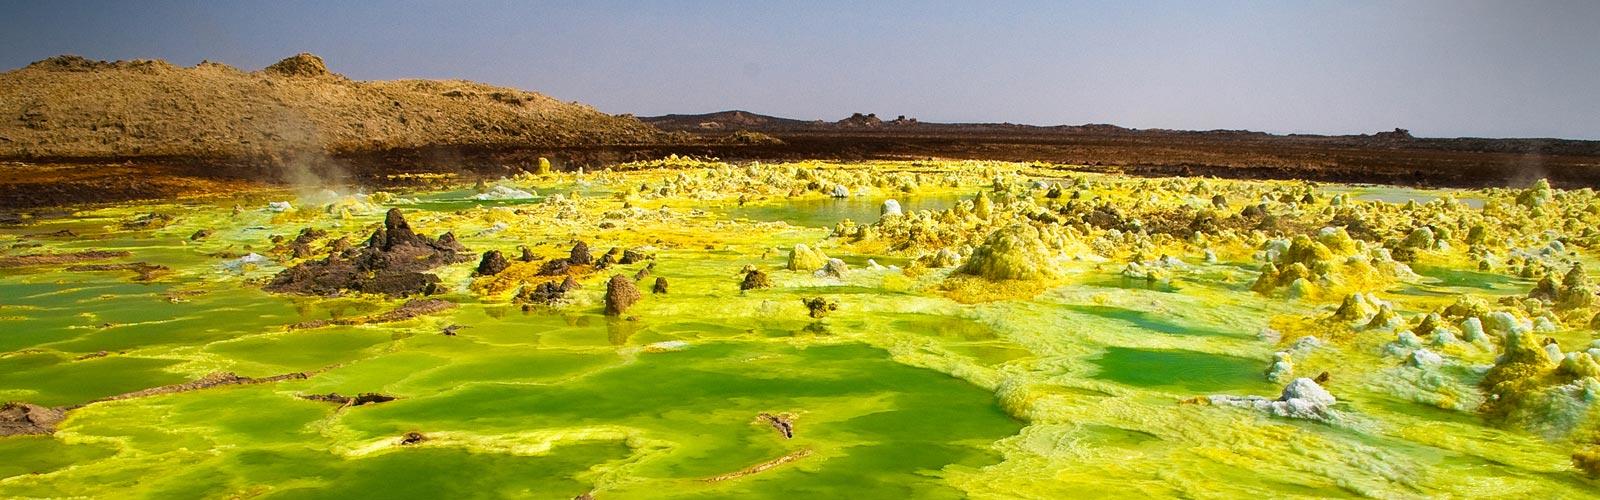 Viaje a Etiopía. 28 Dic.